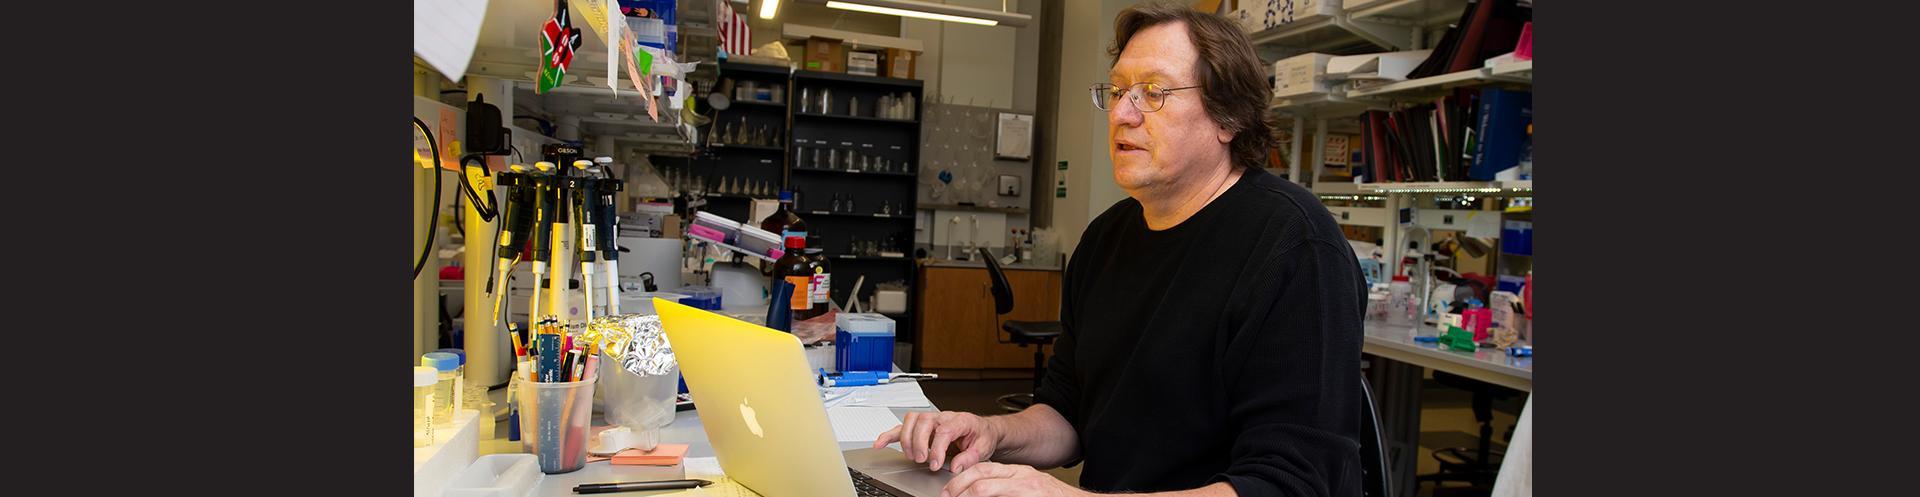 Biologist Awarded Three-Year NIH Grant